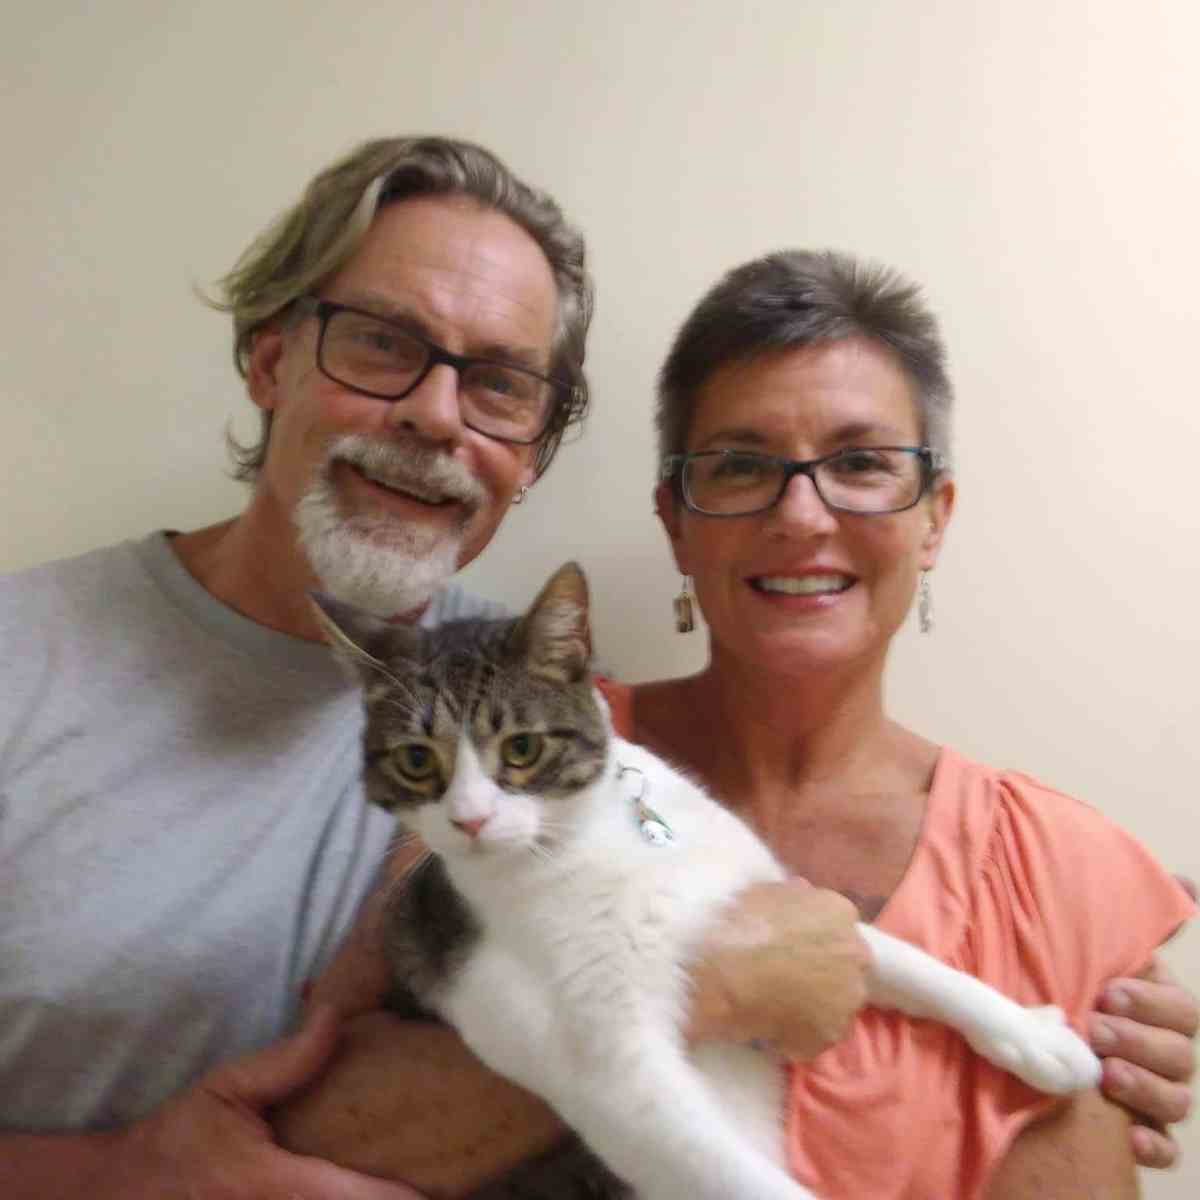 Birmingham, Gatos and Beans, cat adoption, animal adoption, REV Birmingham, Big Pitch